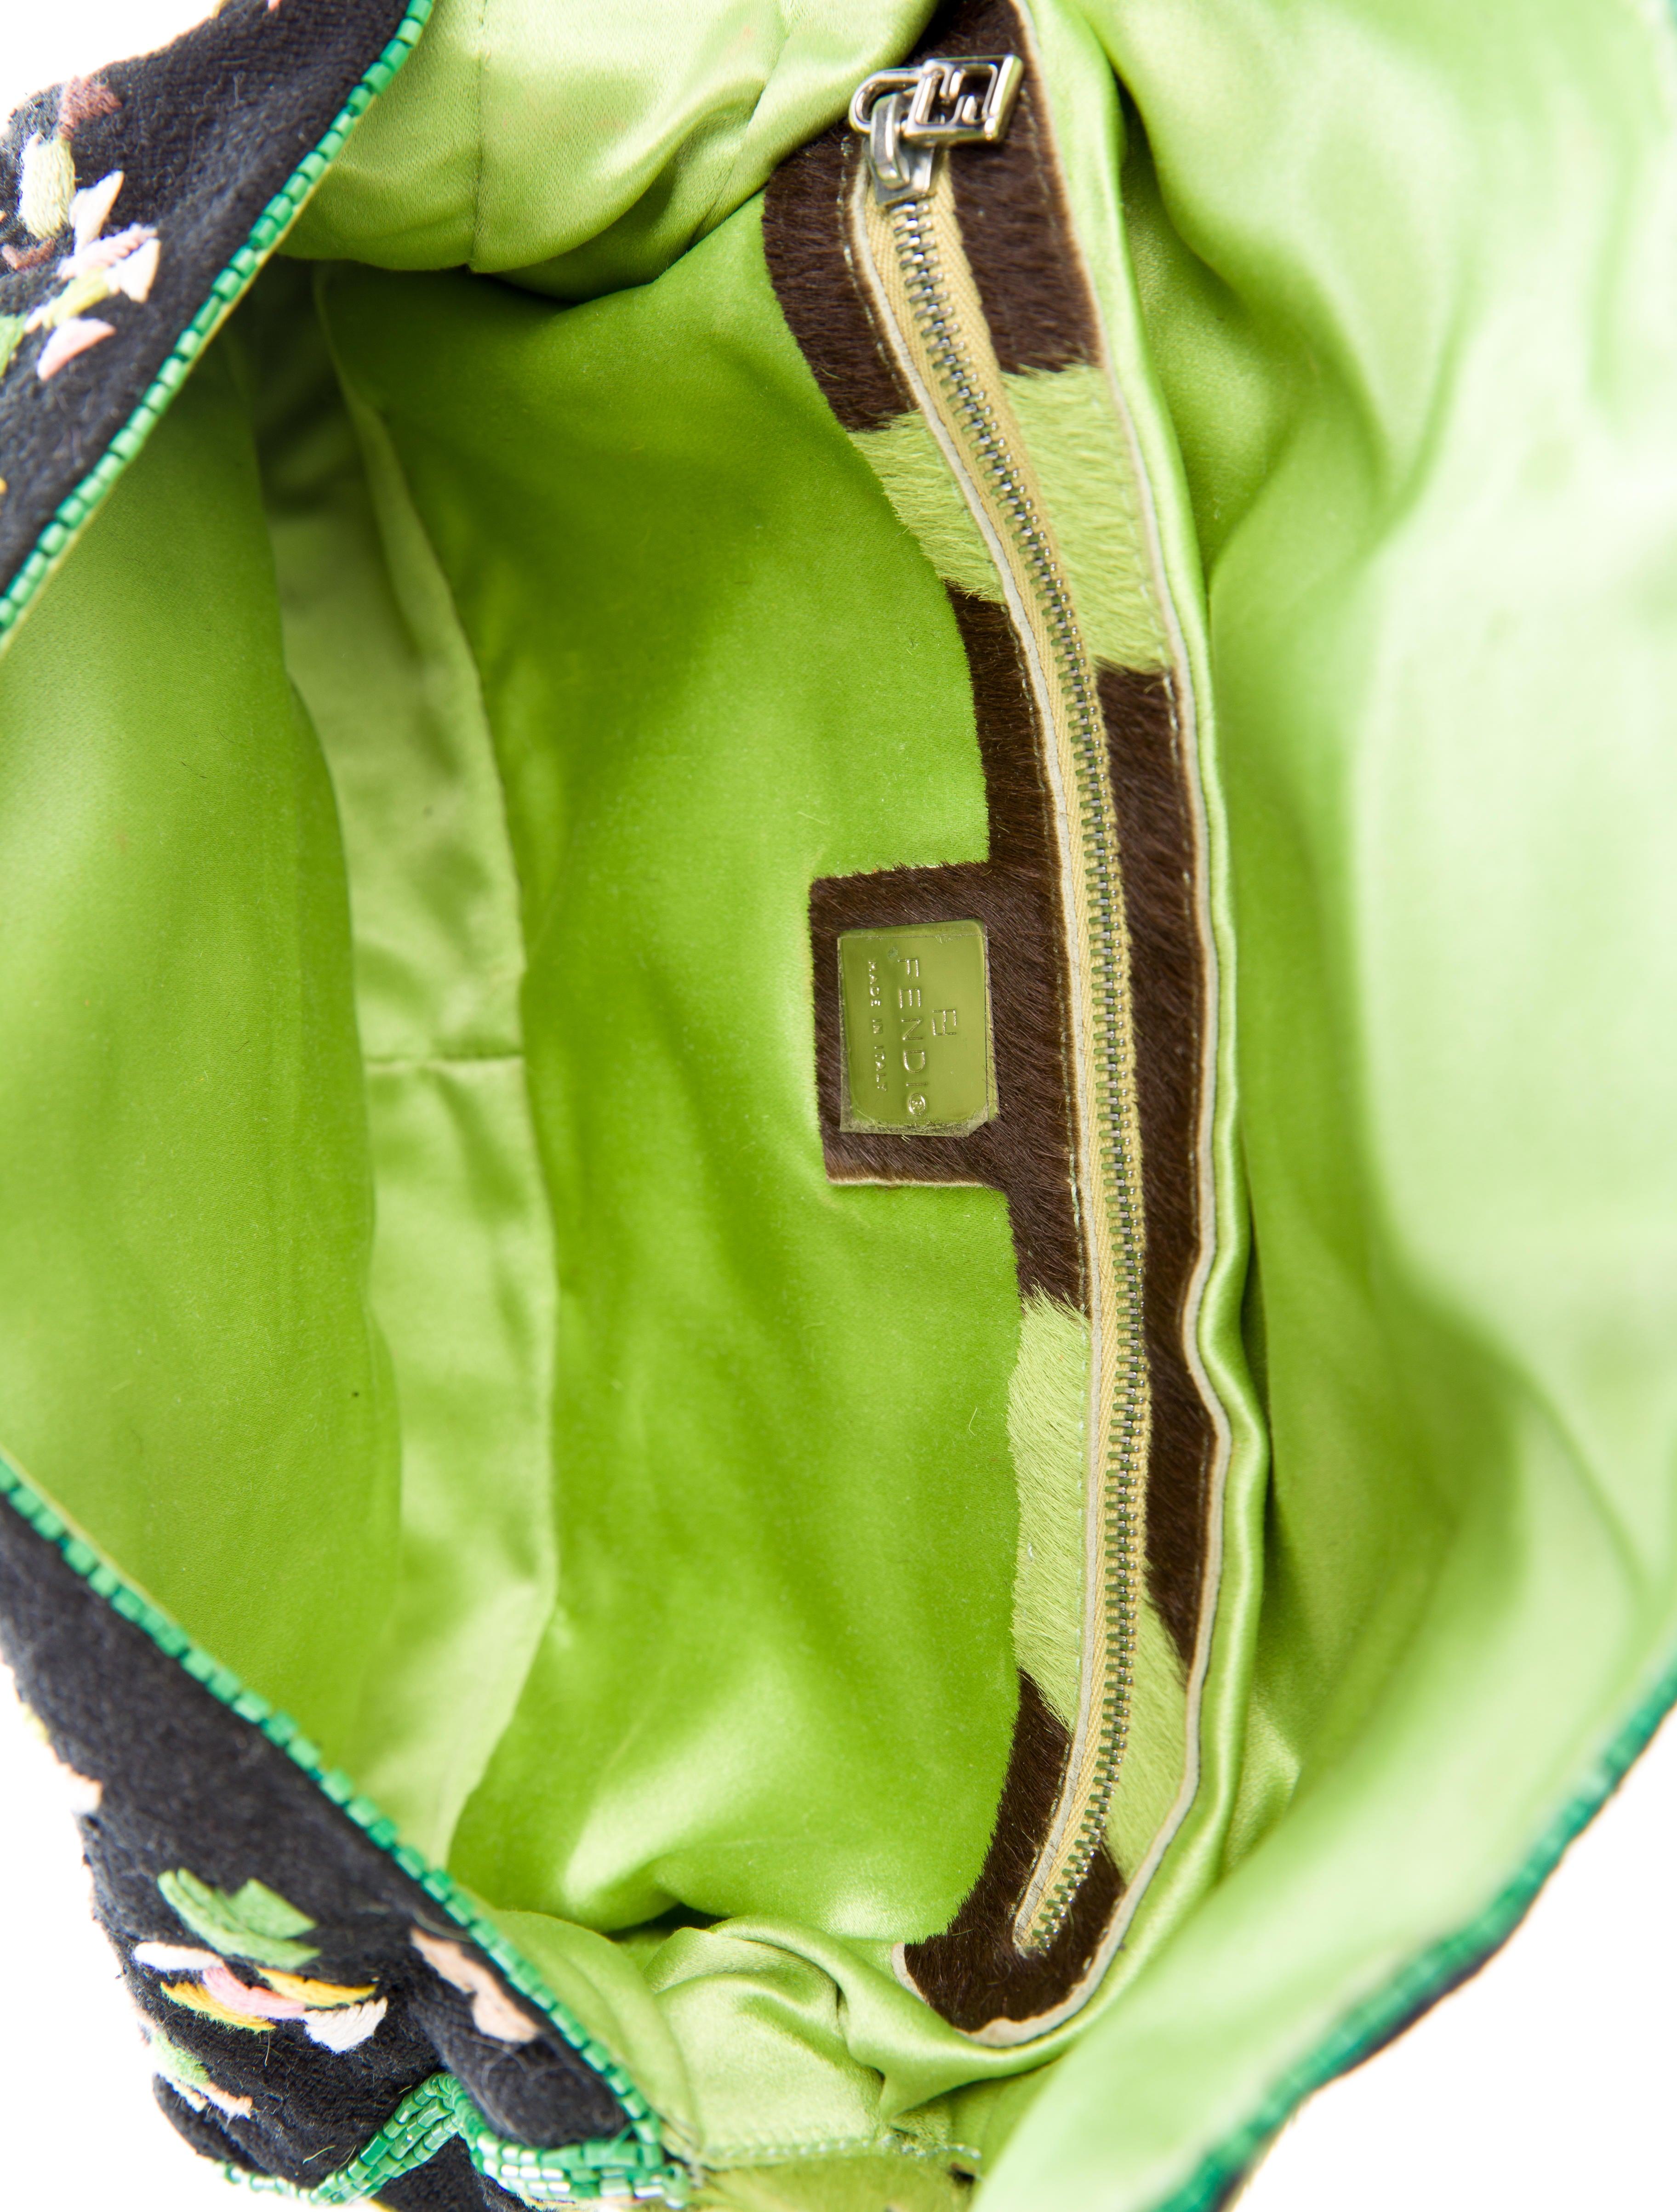 636e10b8029 Fendi Ponyhair-Trimmed Embellished Baguette - Handbags - FEN51198 ...